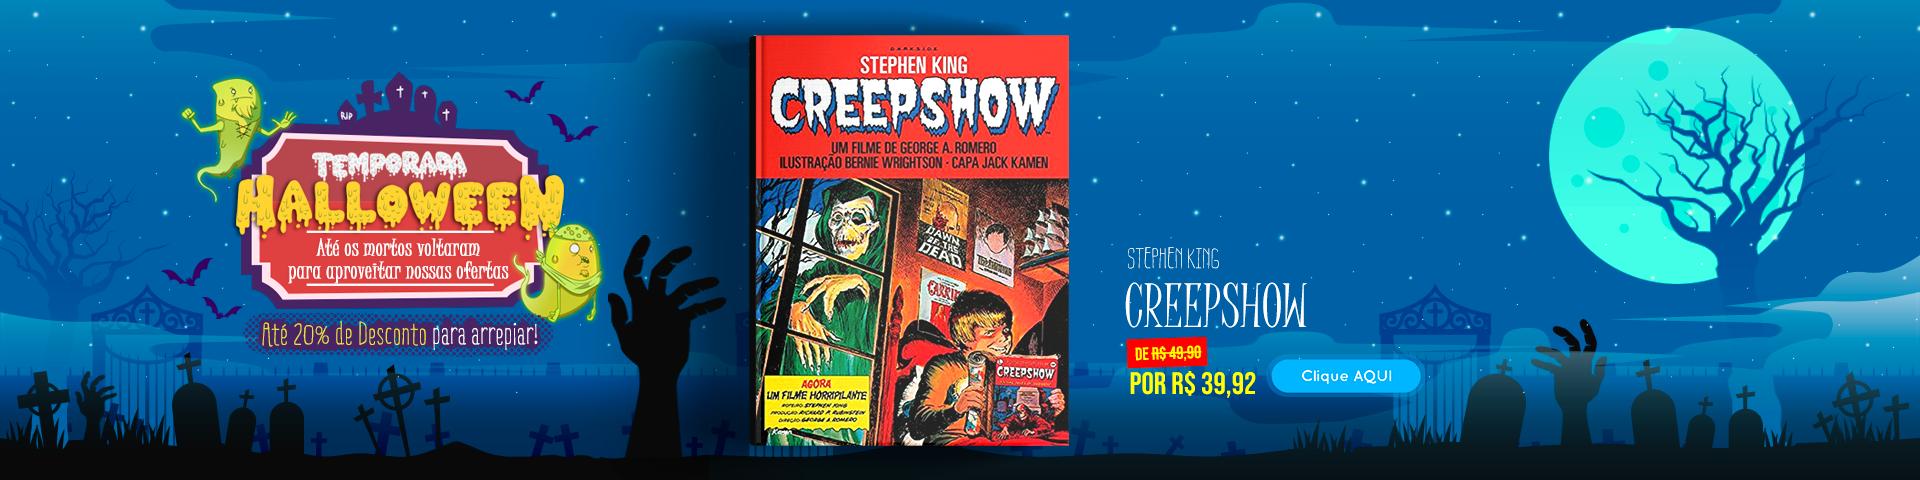 Halloween - Creepshow